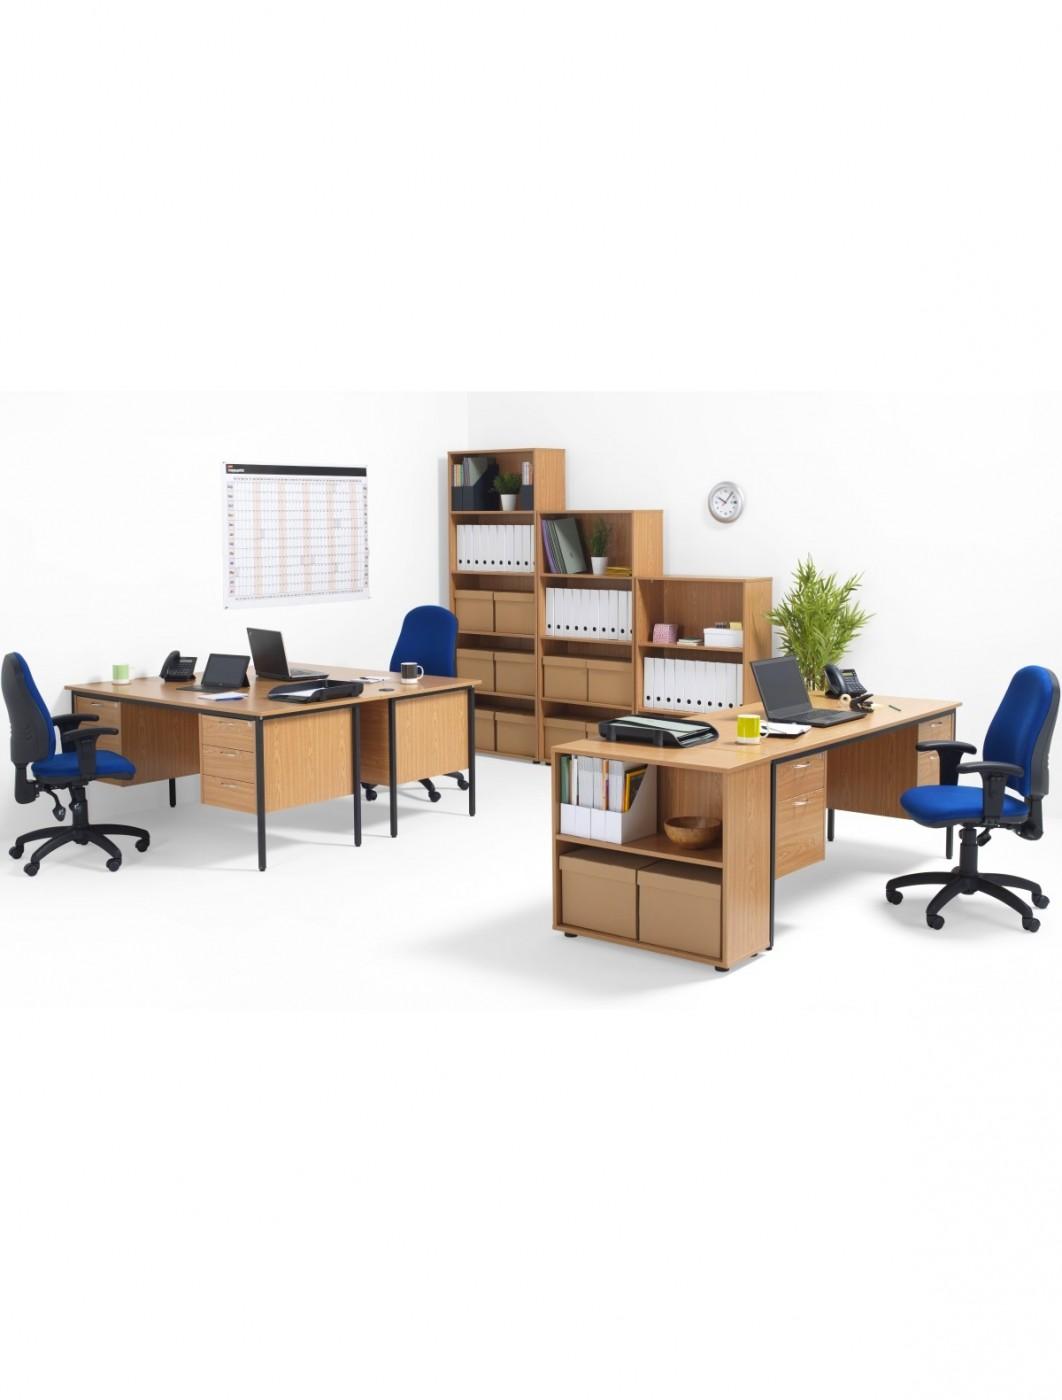 Home Office Furniture Uk Desk Set 18: Oak Office Desk 1786x746mm TC Start 18 Desk STB17RECDRW6OK